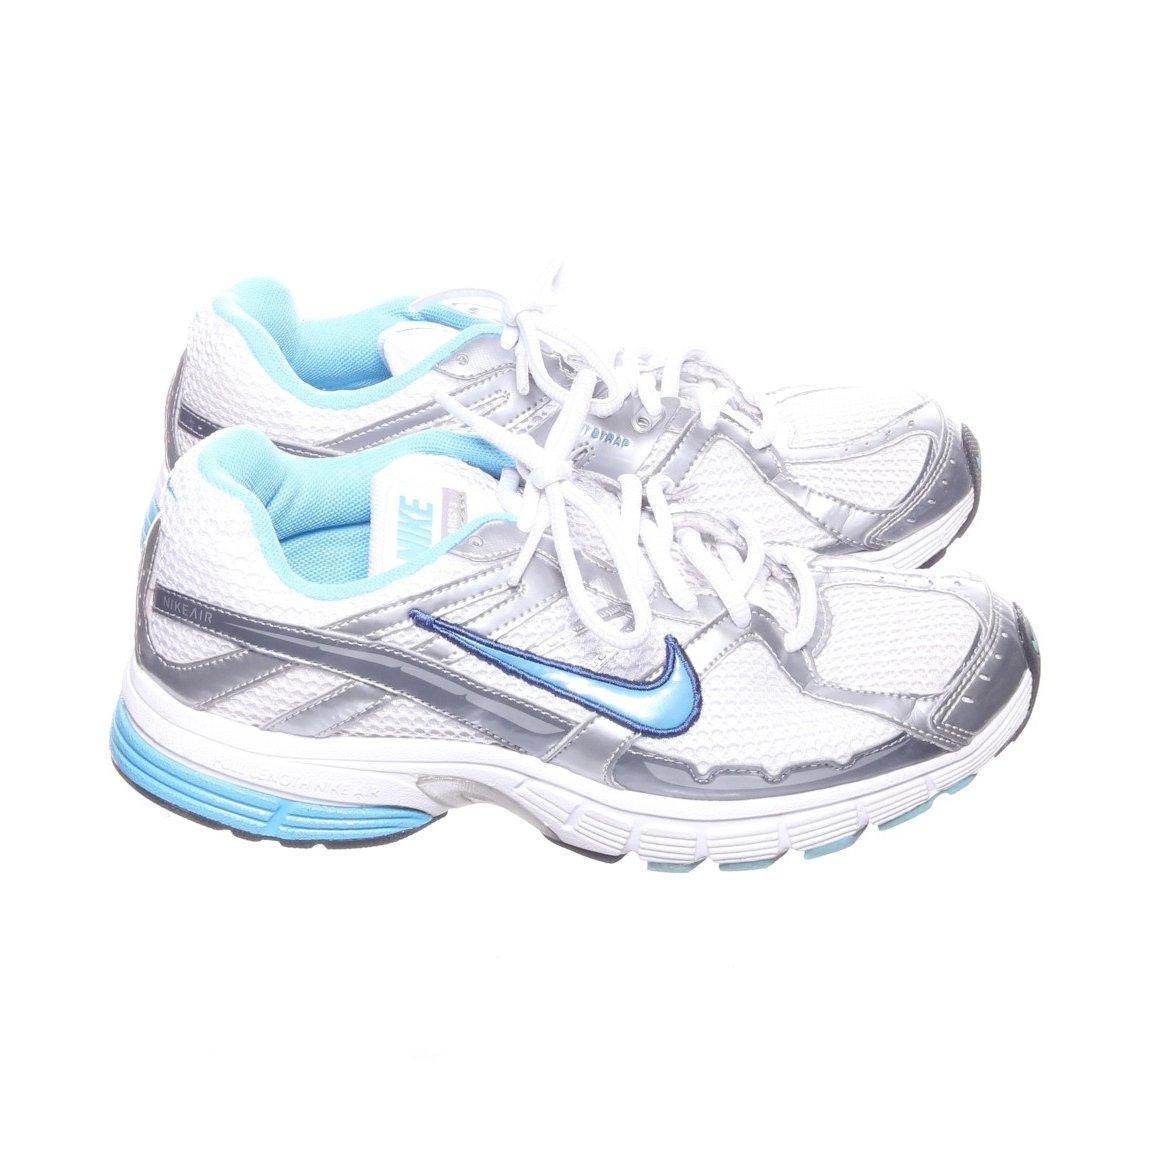 Nike, Träningsskor, Strl: 38, Air alaris .. (349958020) ᐈ